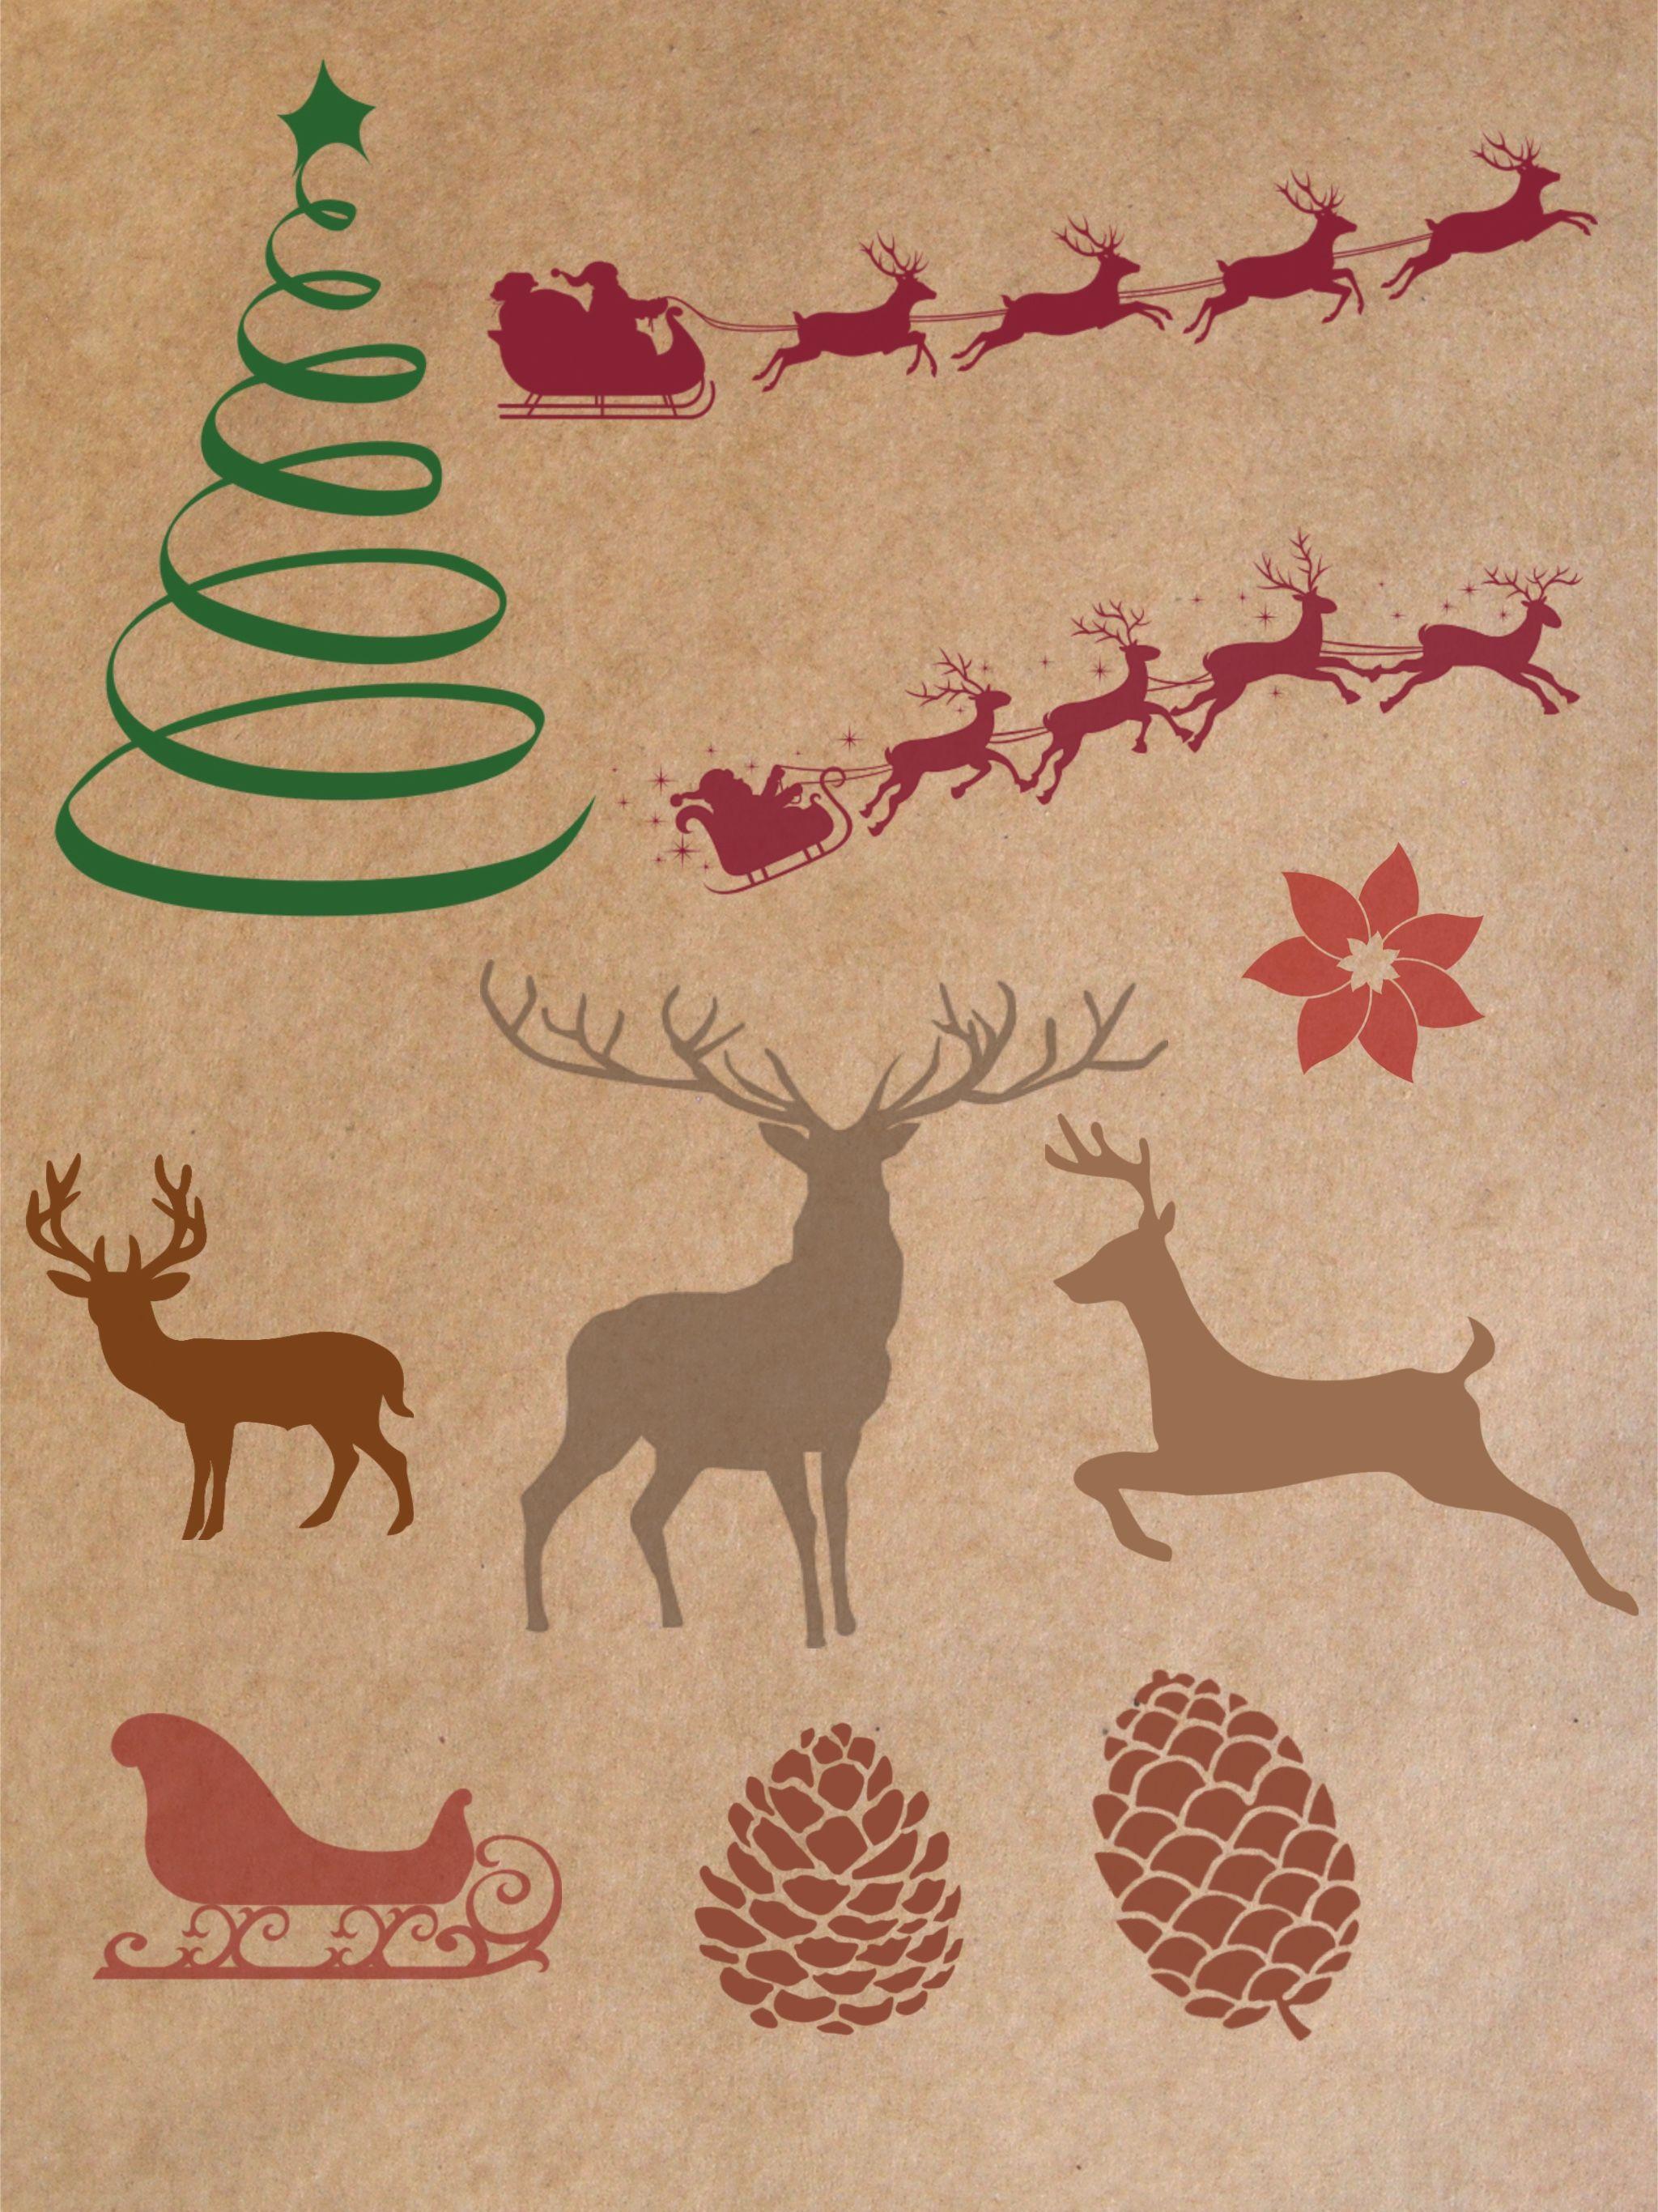 Free Procreate Christmas Stamp Brushes Part 2 Free Procreate Christmas Stamps Procreate